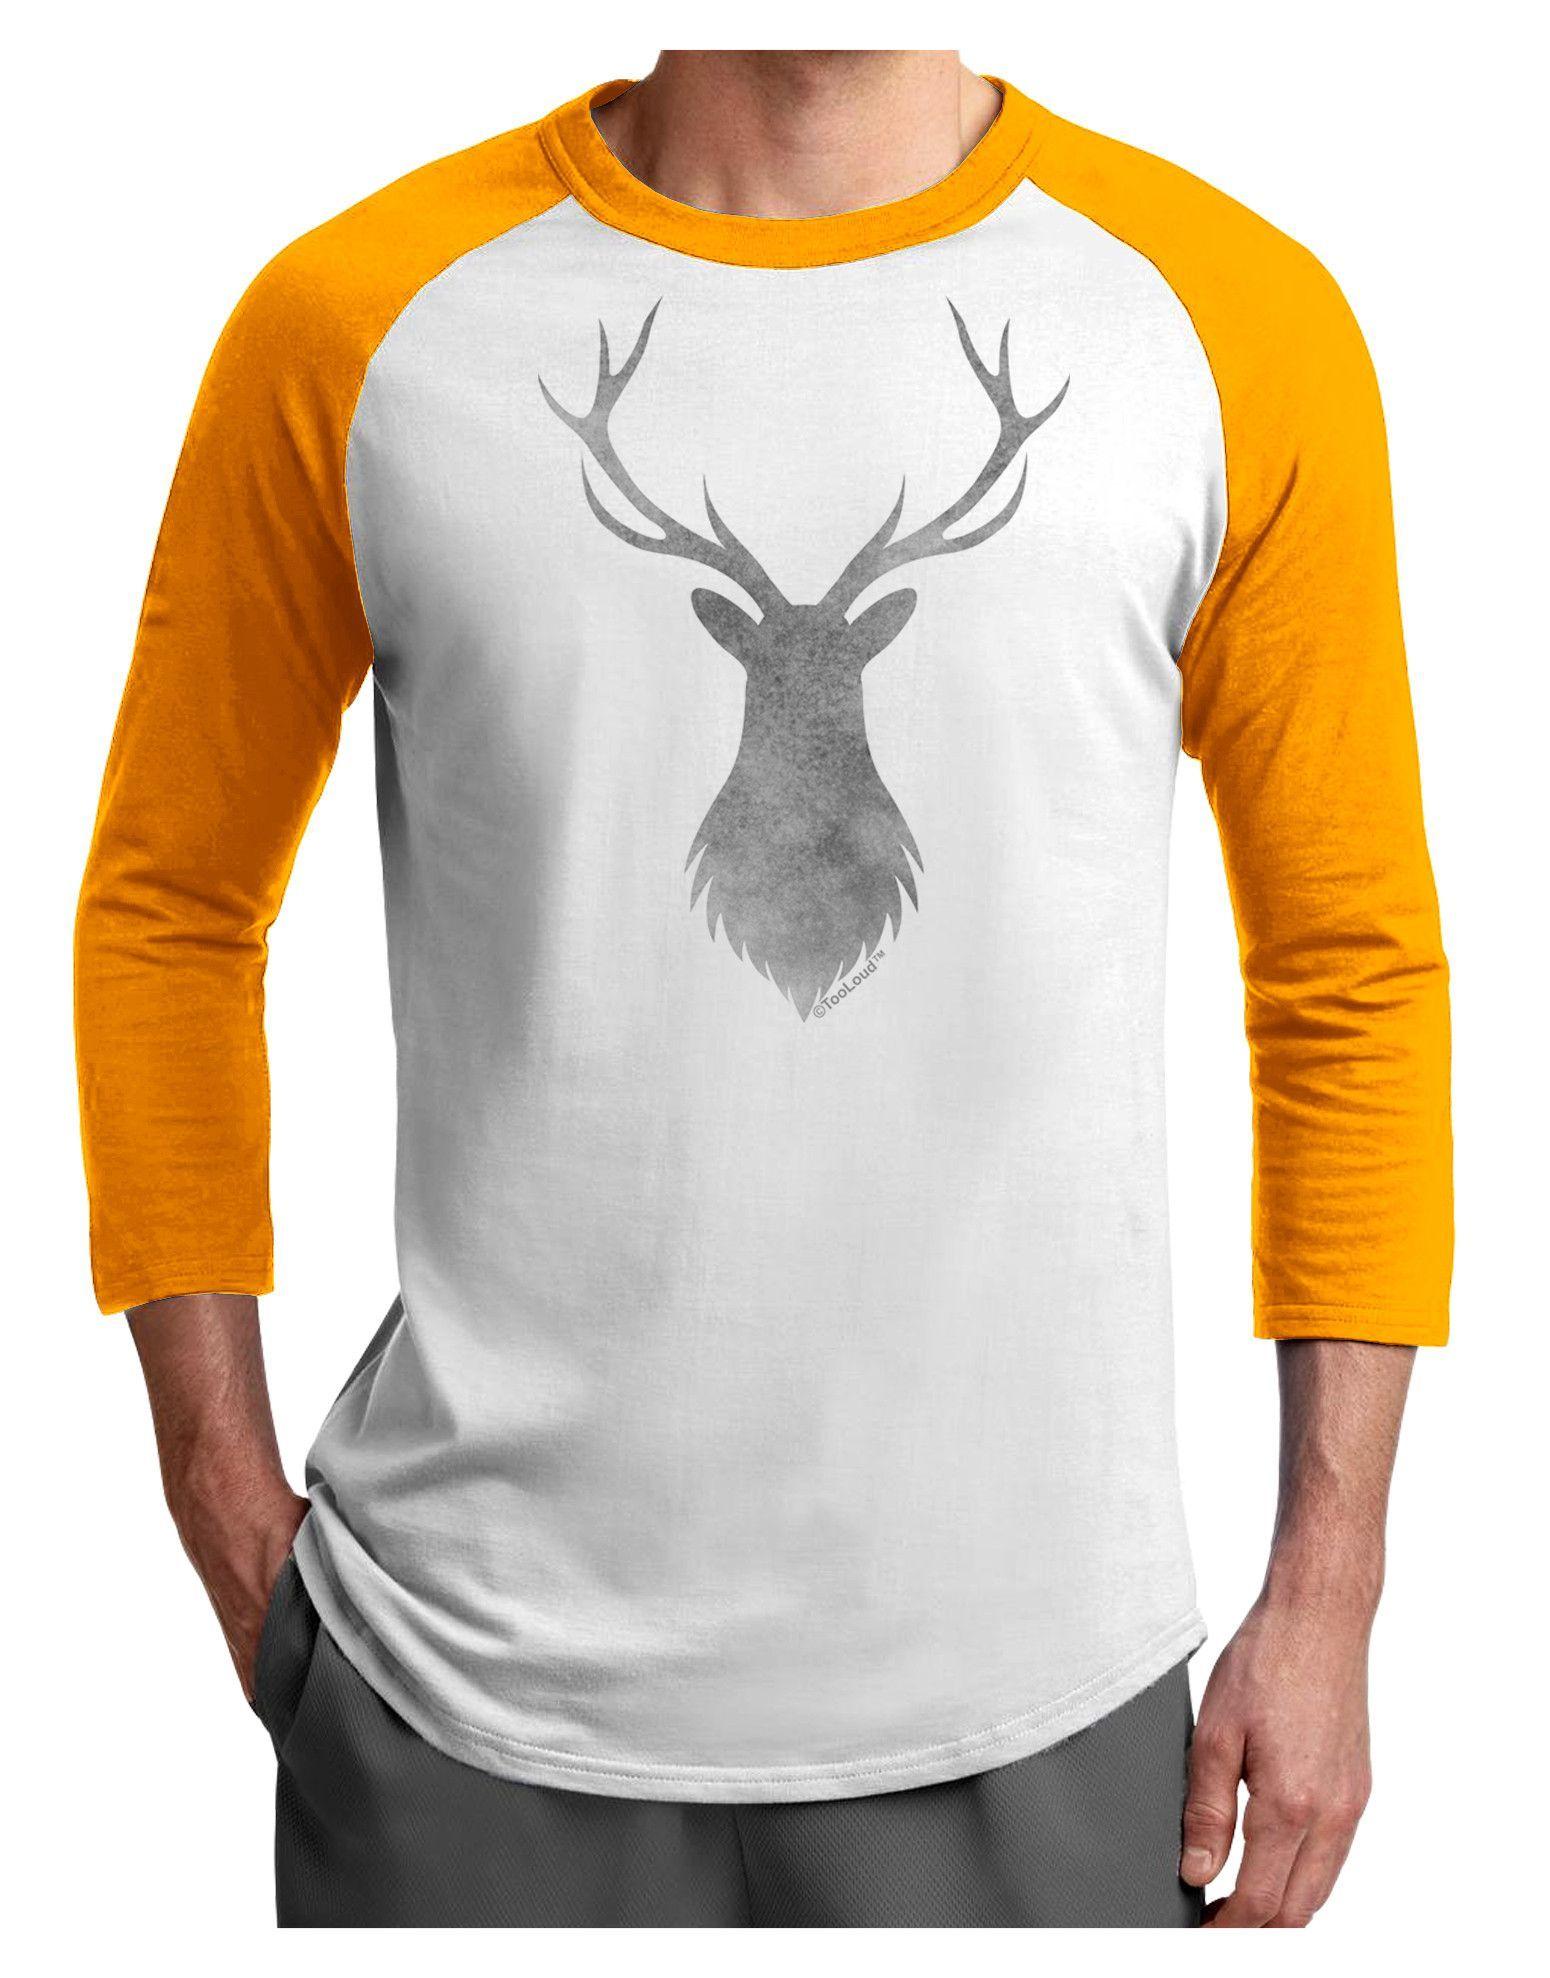 TooLoud Majestic Stag Distressed Adult Raglan Shirt